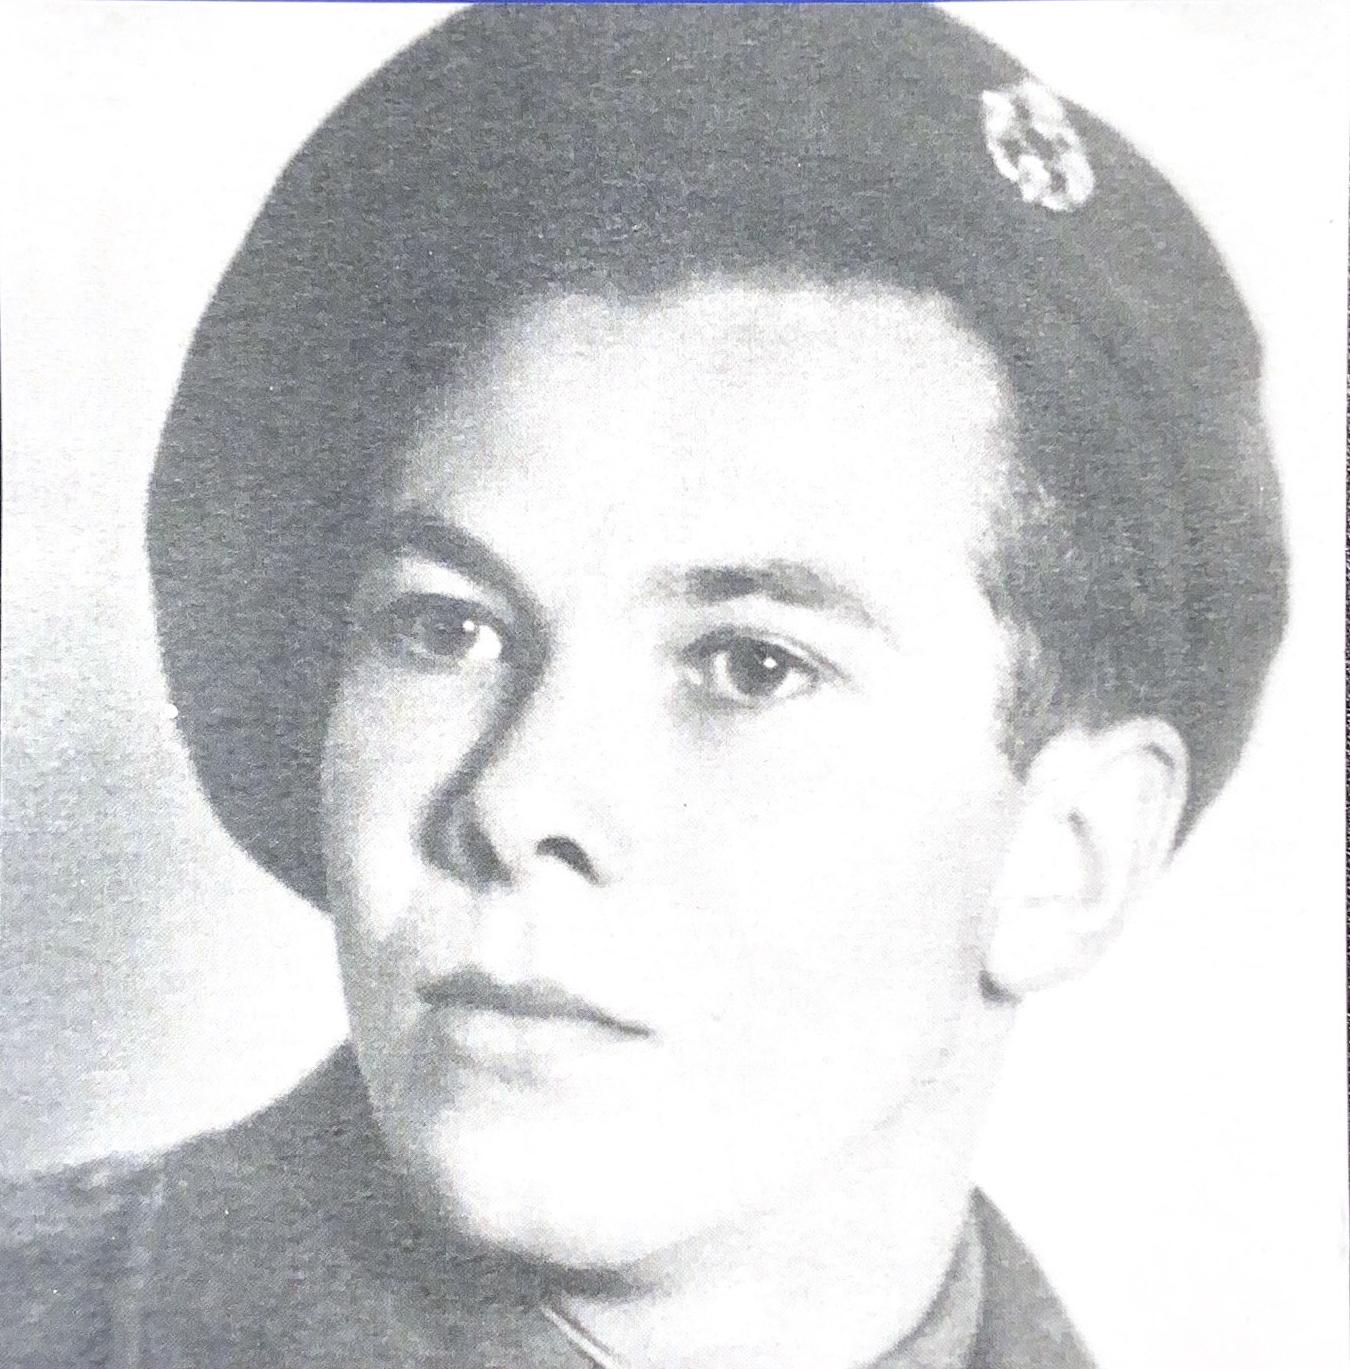 Photo of Bert during the War